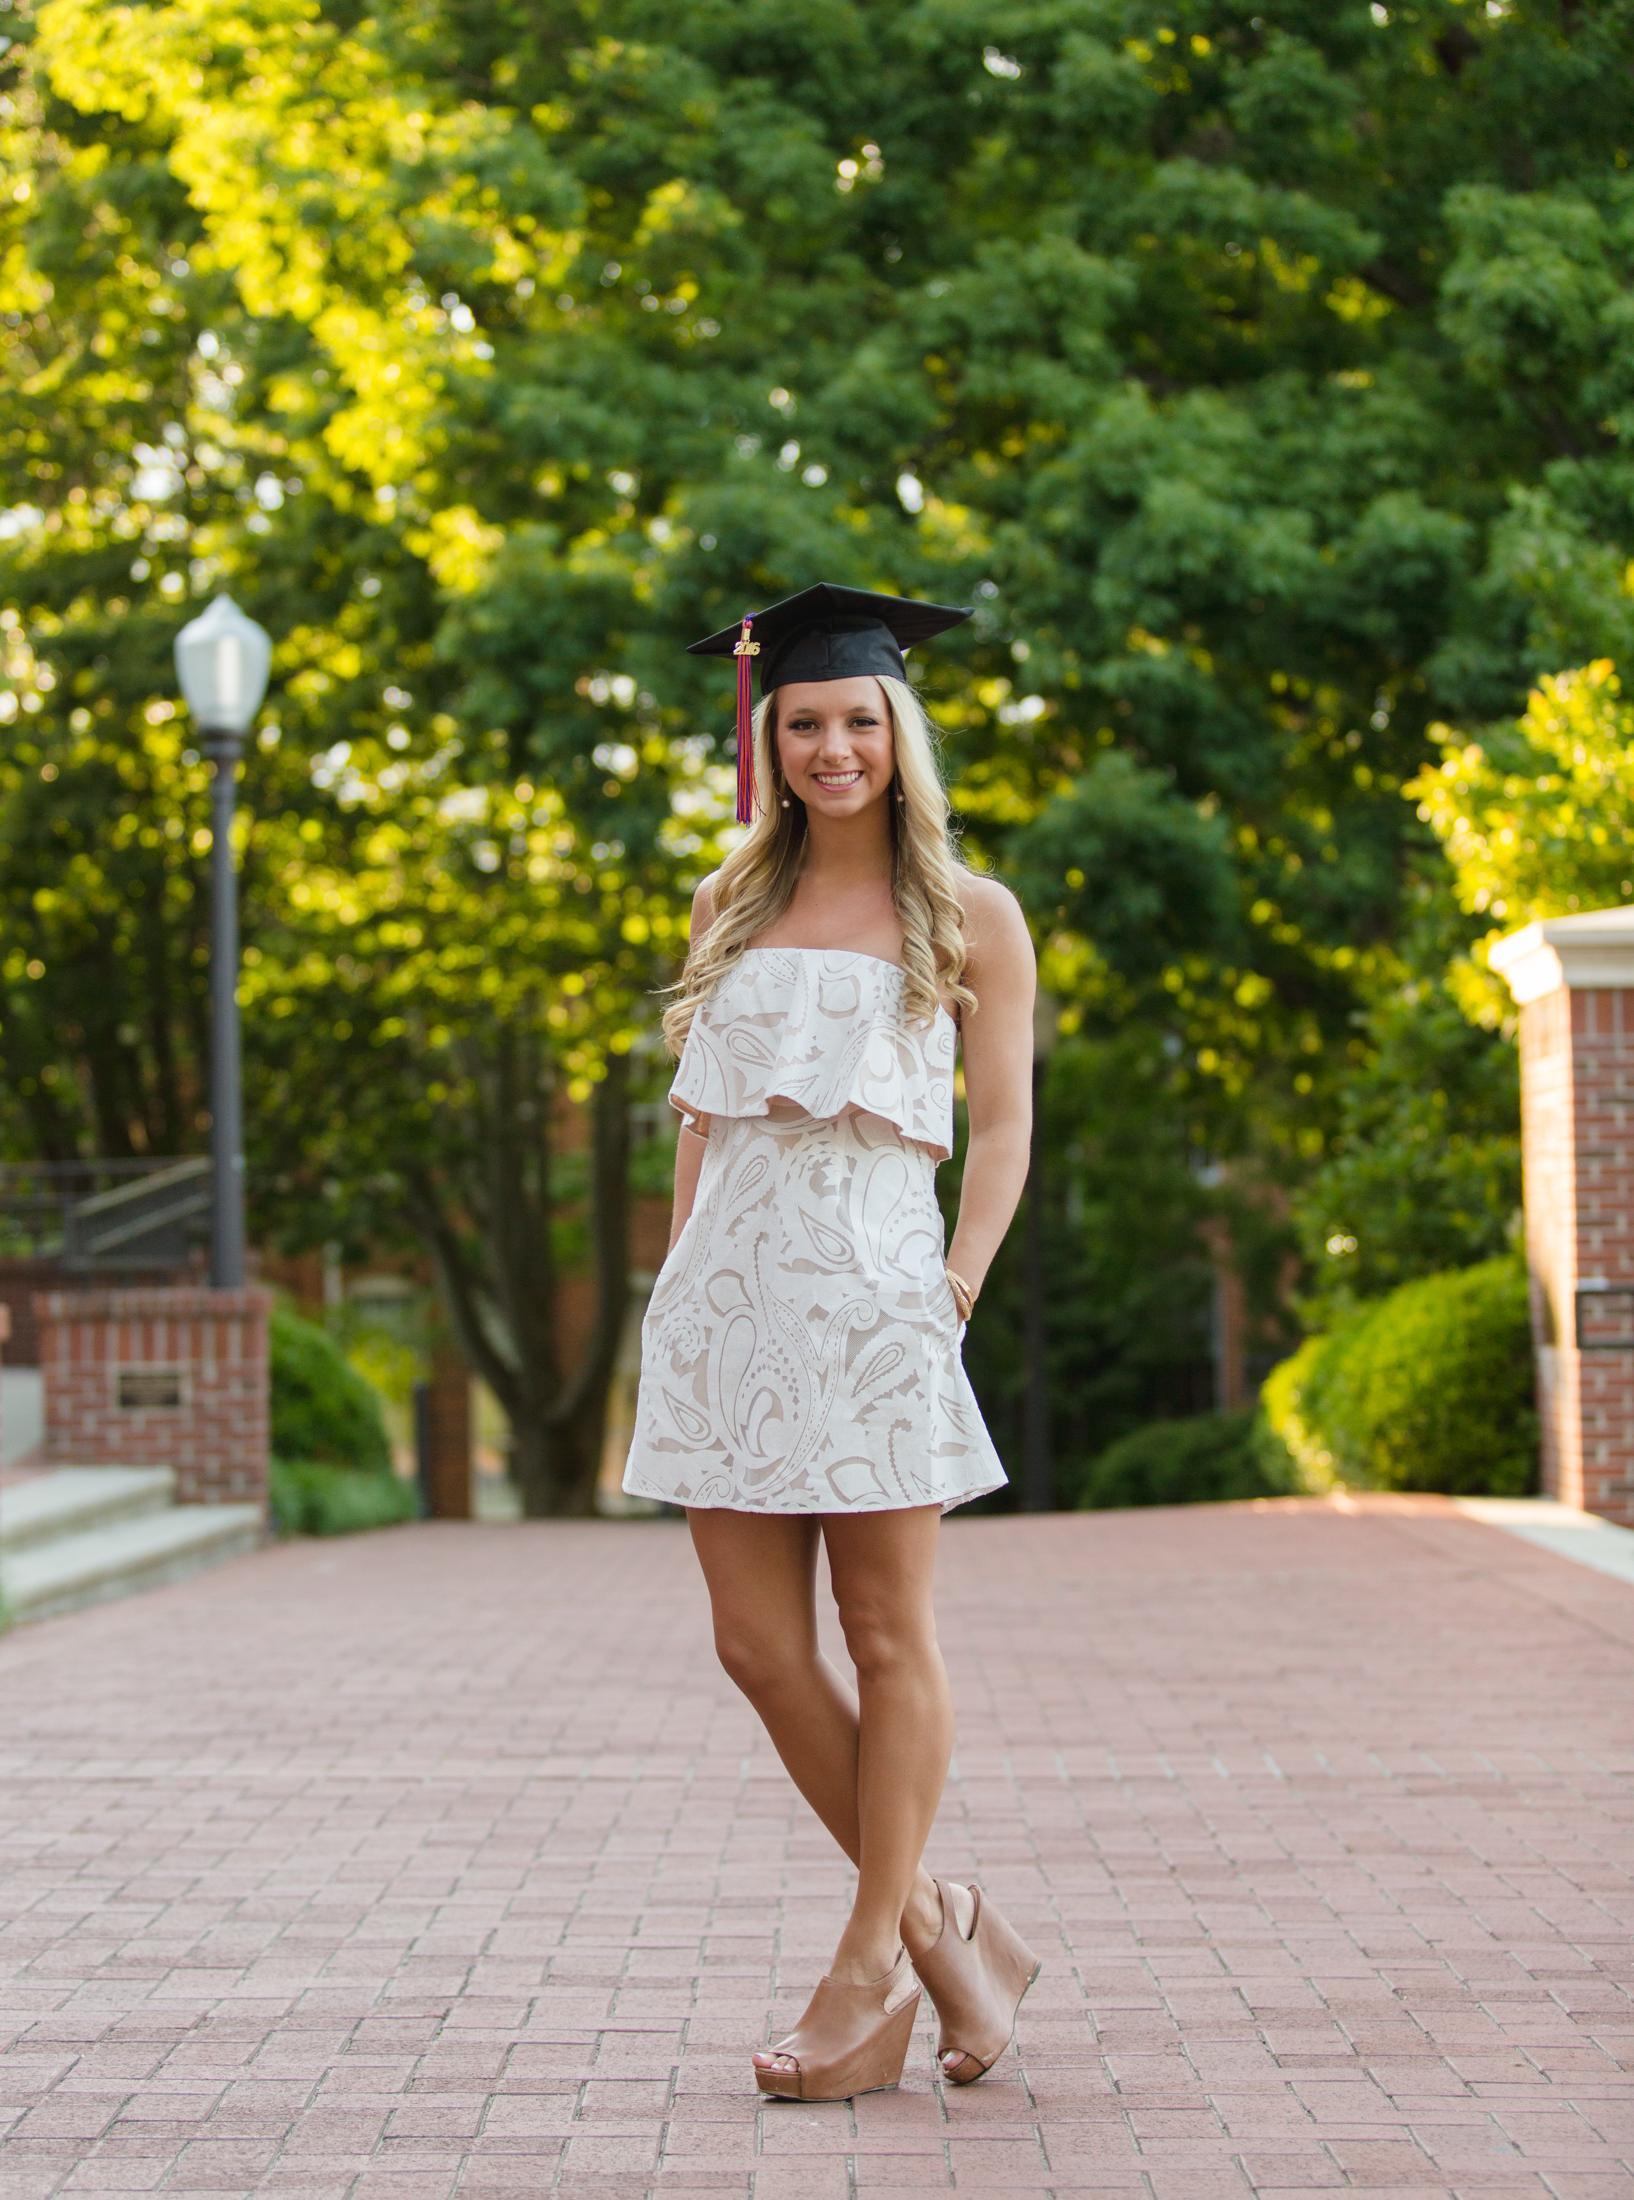 Caroline Potter-Clemson University_DP_2016-7833.jpg